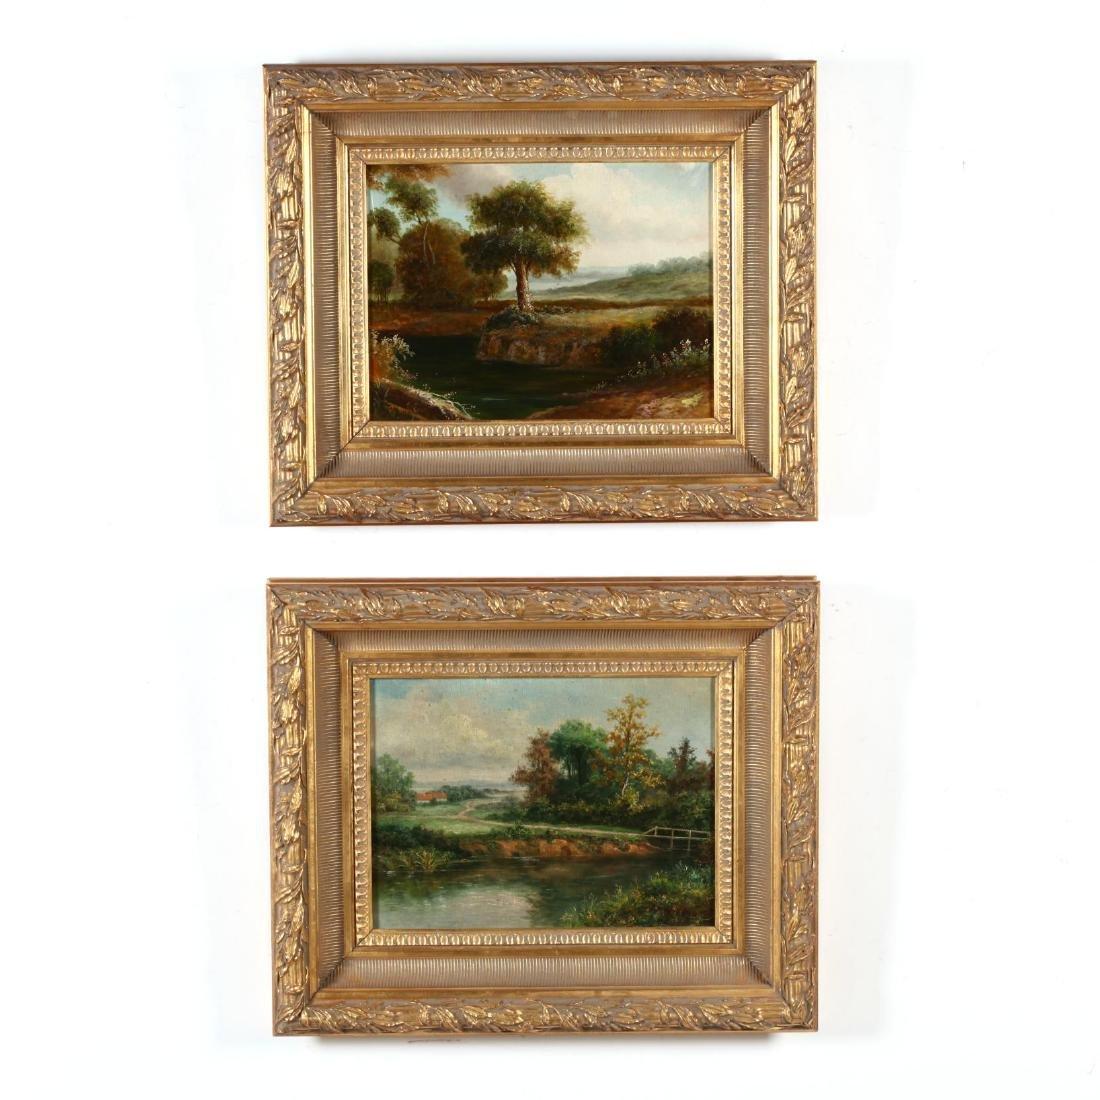 A Pair of Antique Style Decorative Landscape Paintings